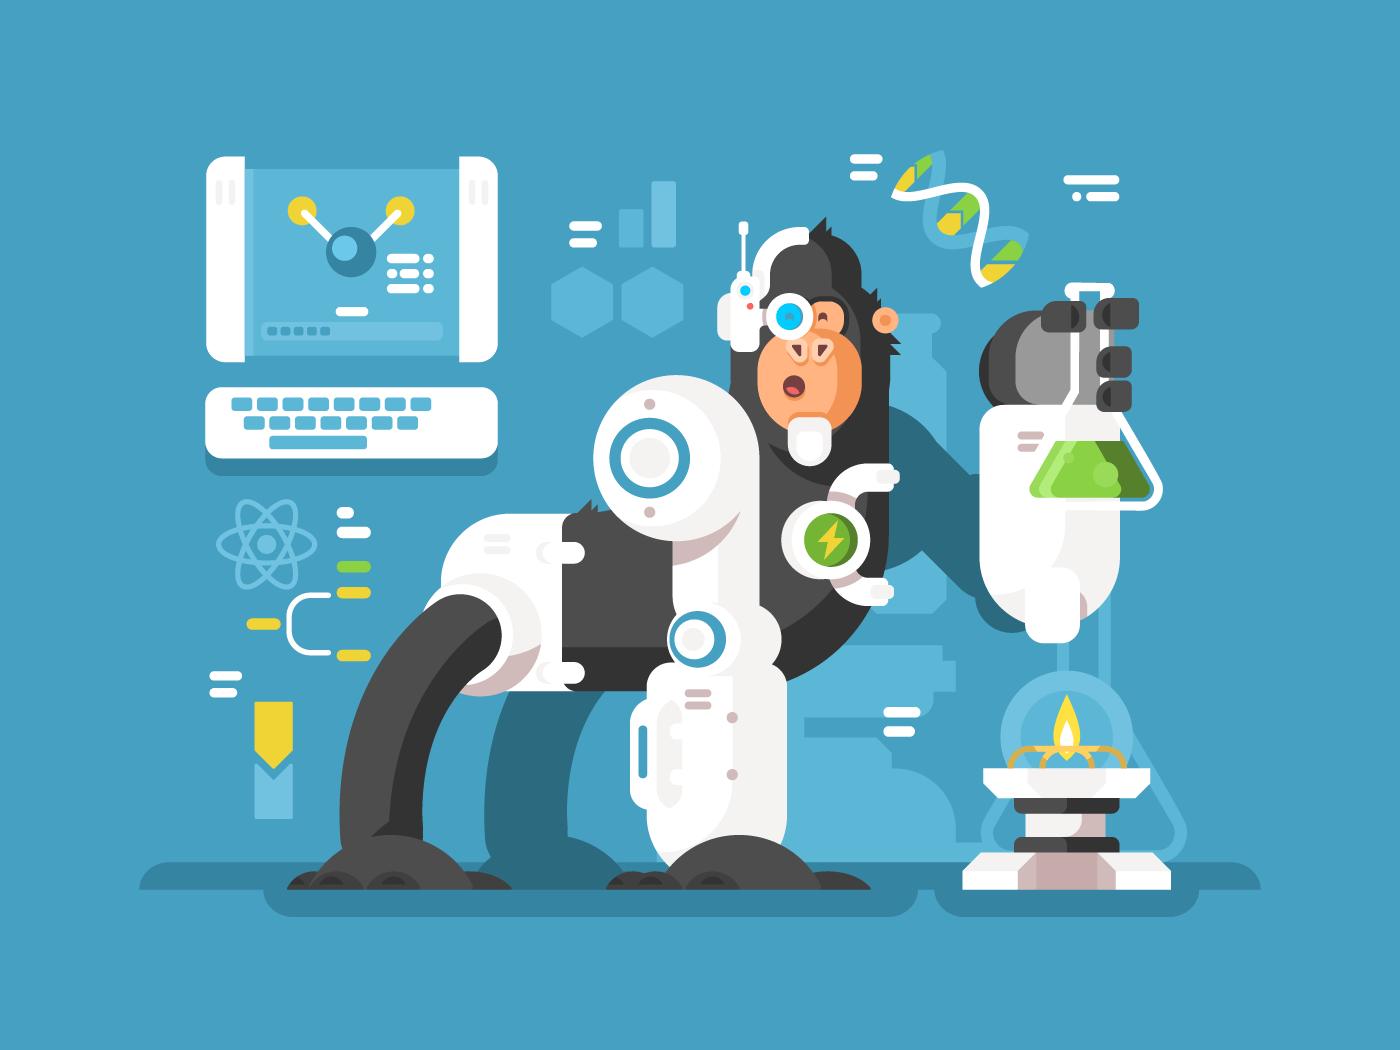 Robot monkey scientist flat vector illustration